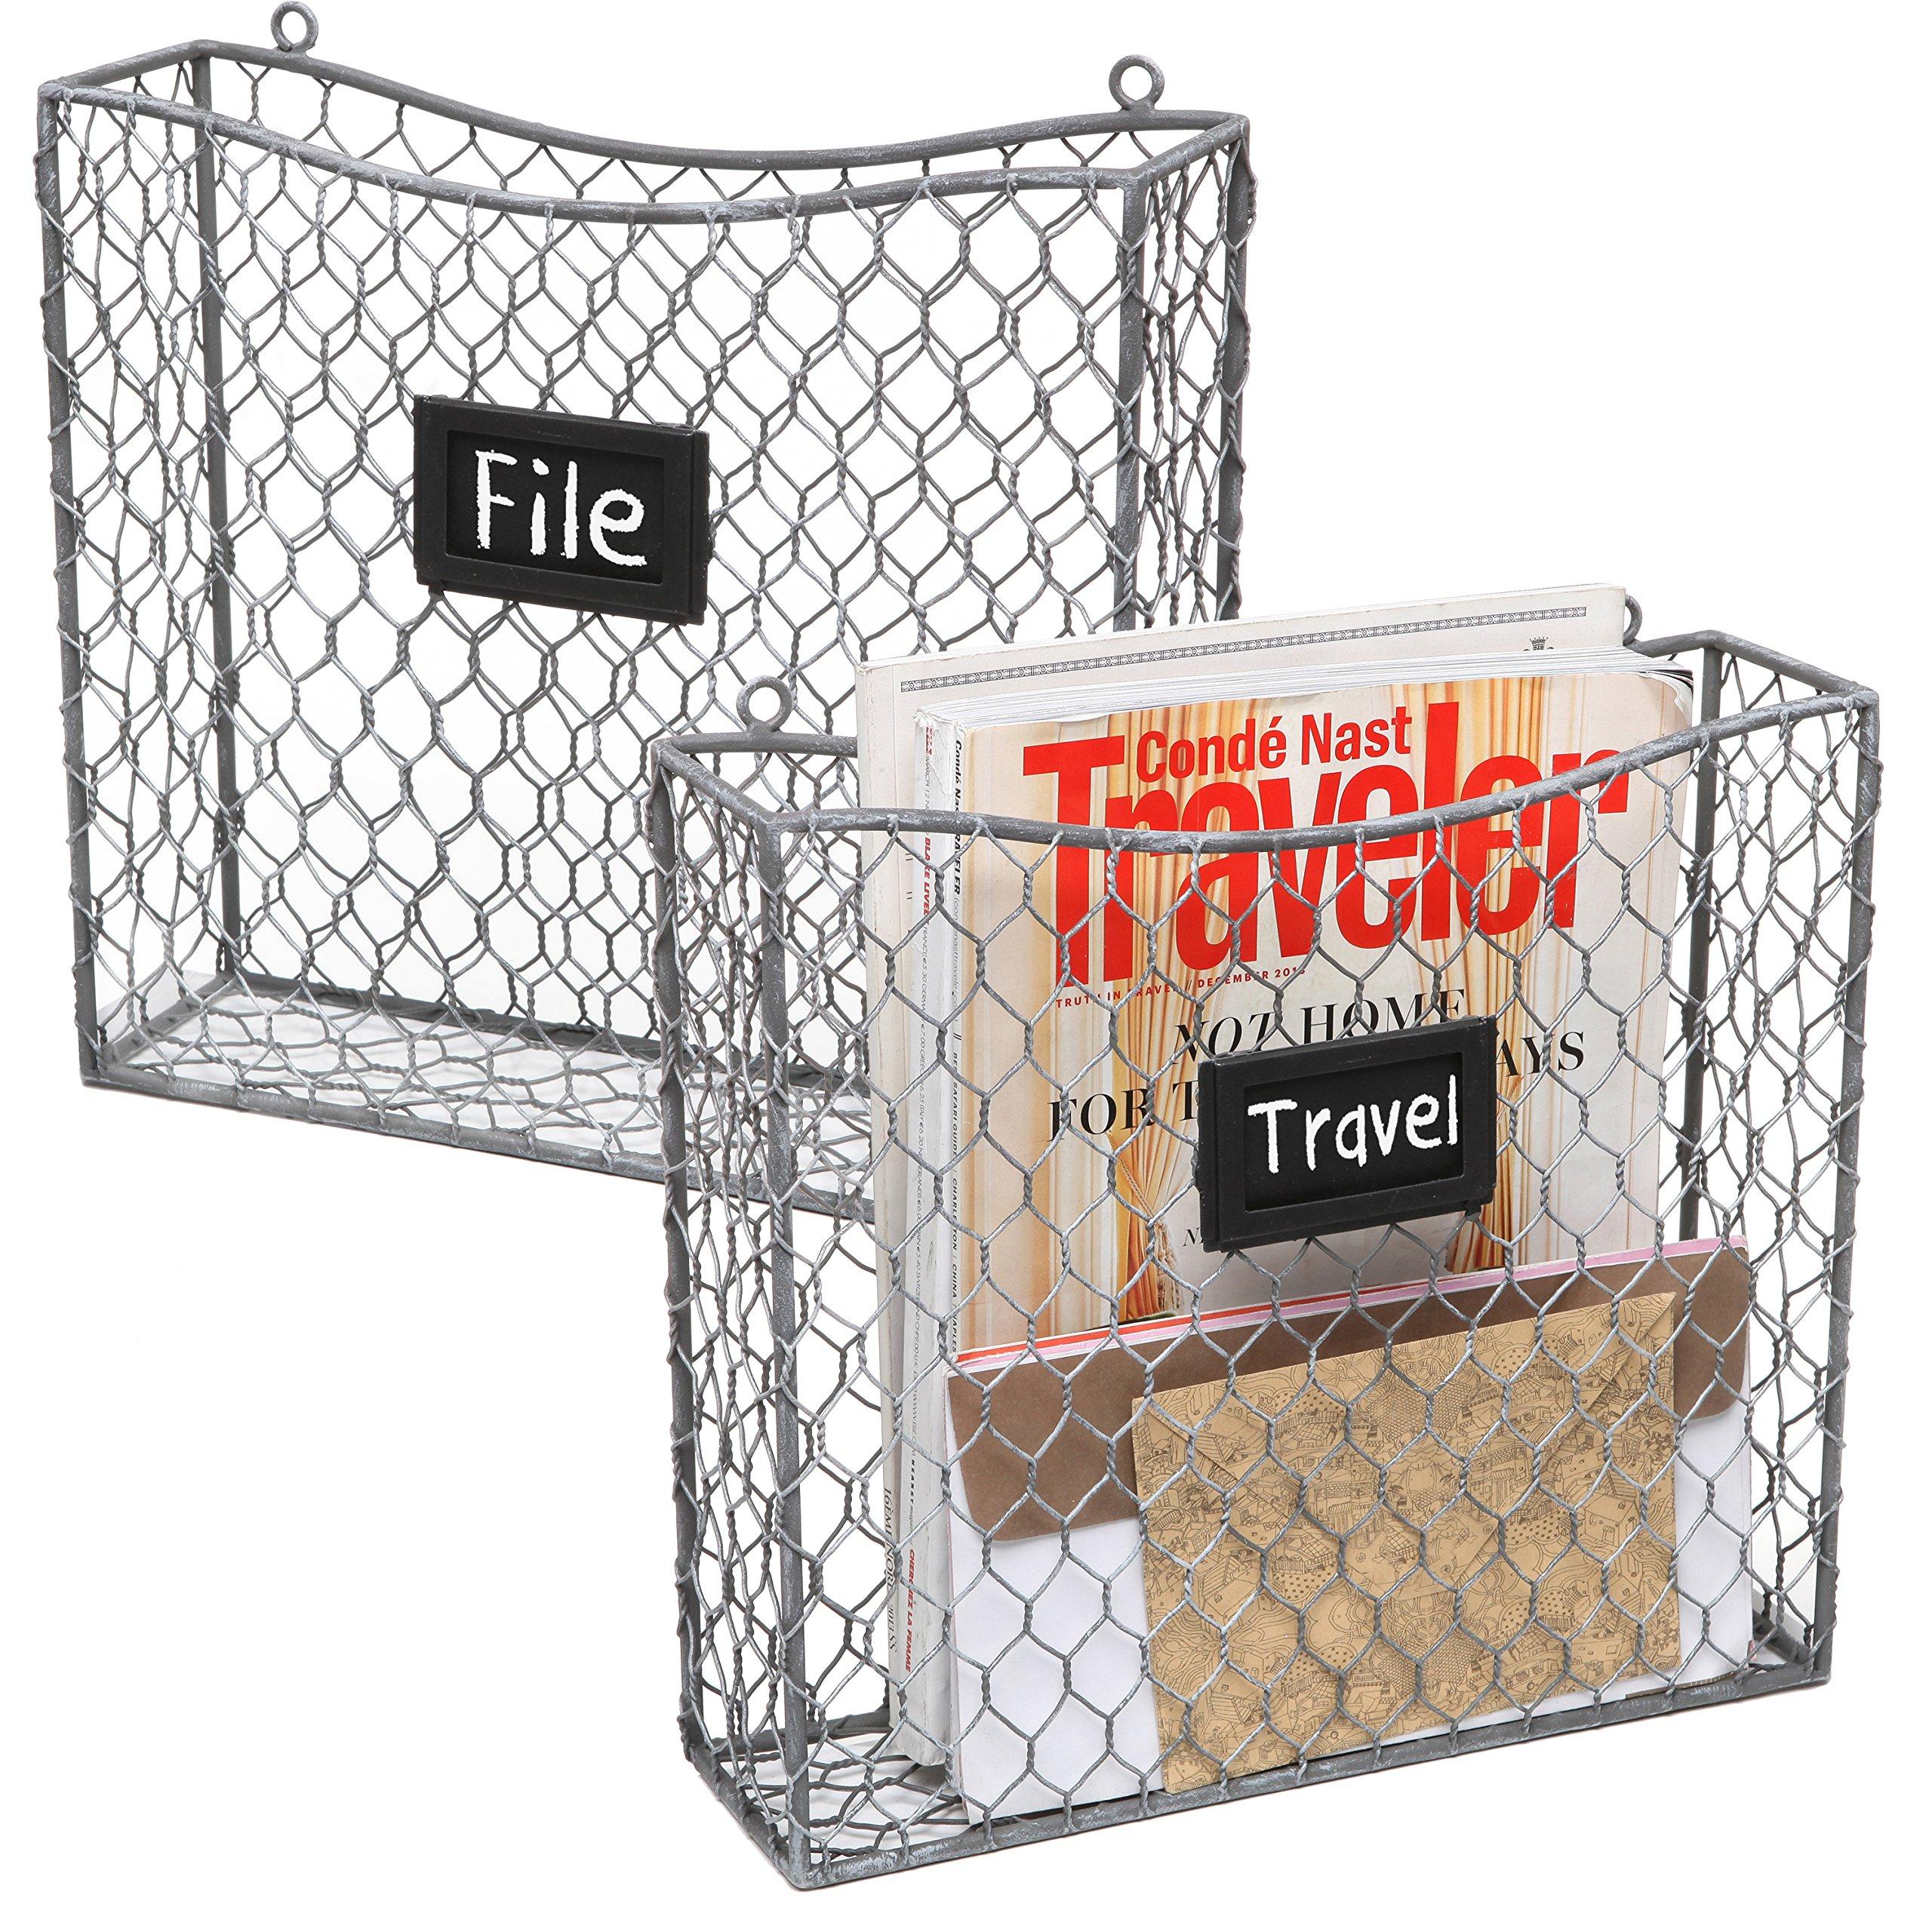 MyGift Metal Wire Wall Mounted Magazine, File & Mail Holder Basket w/ Chalkboard Label, Set of 2, Gray